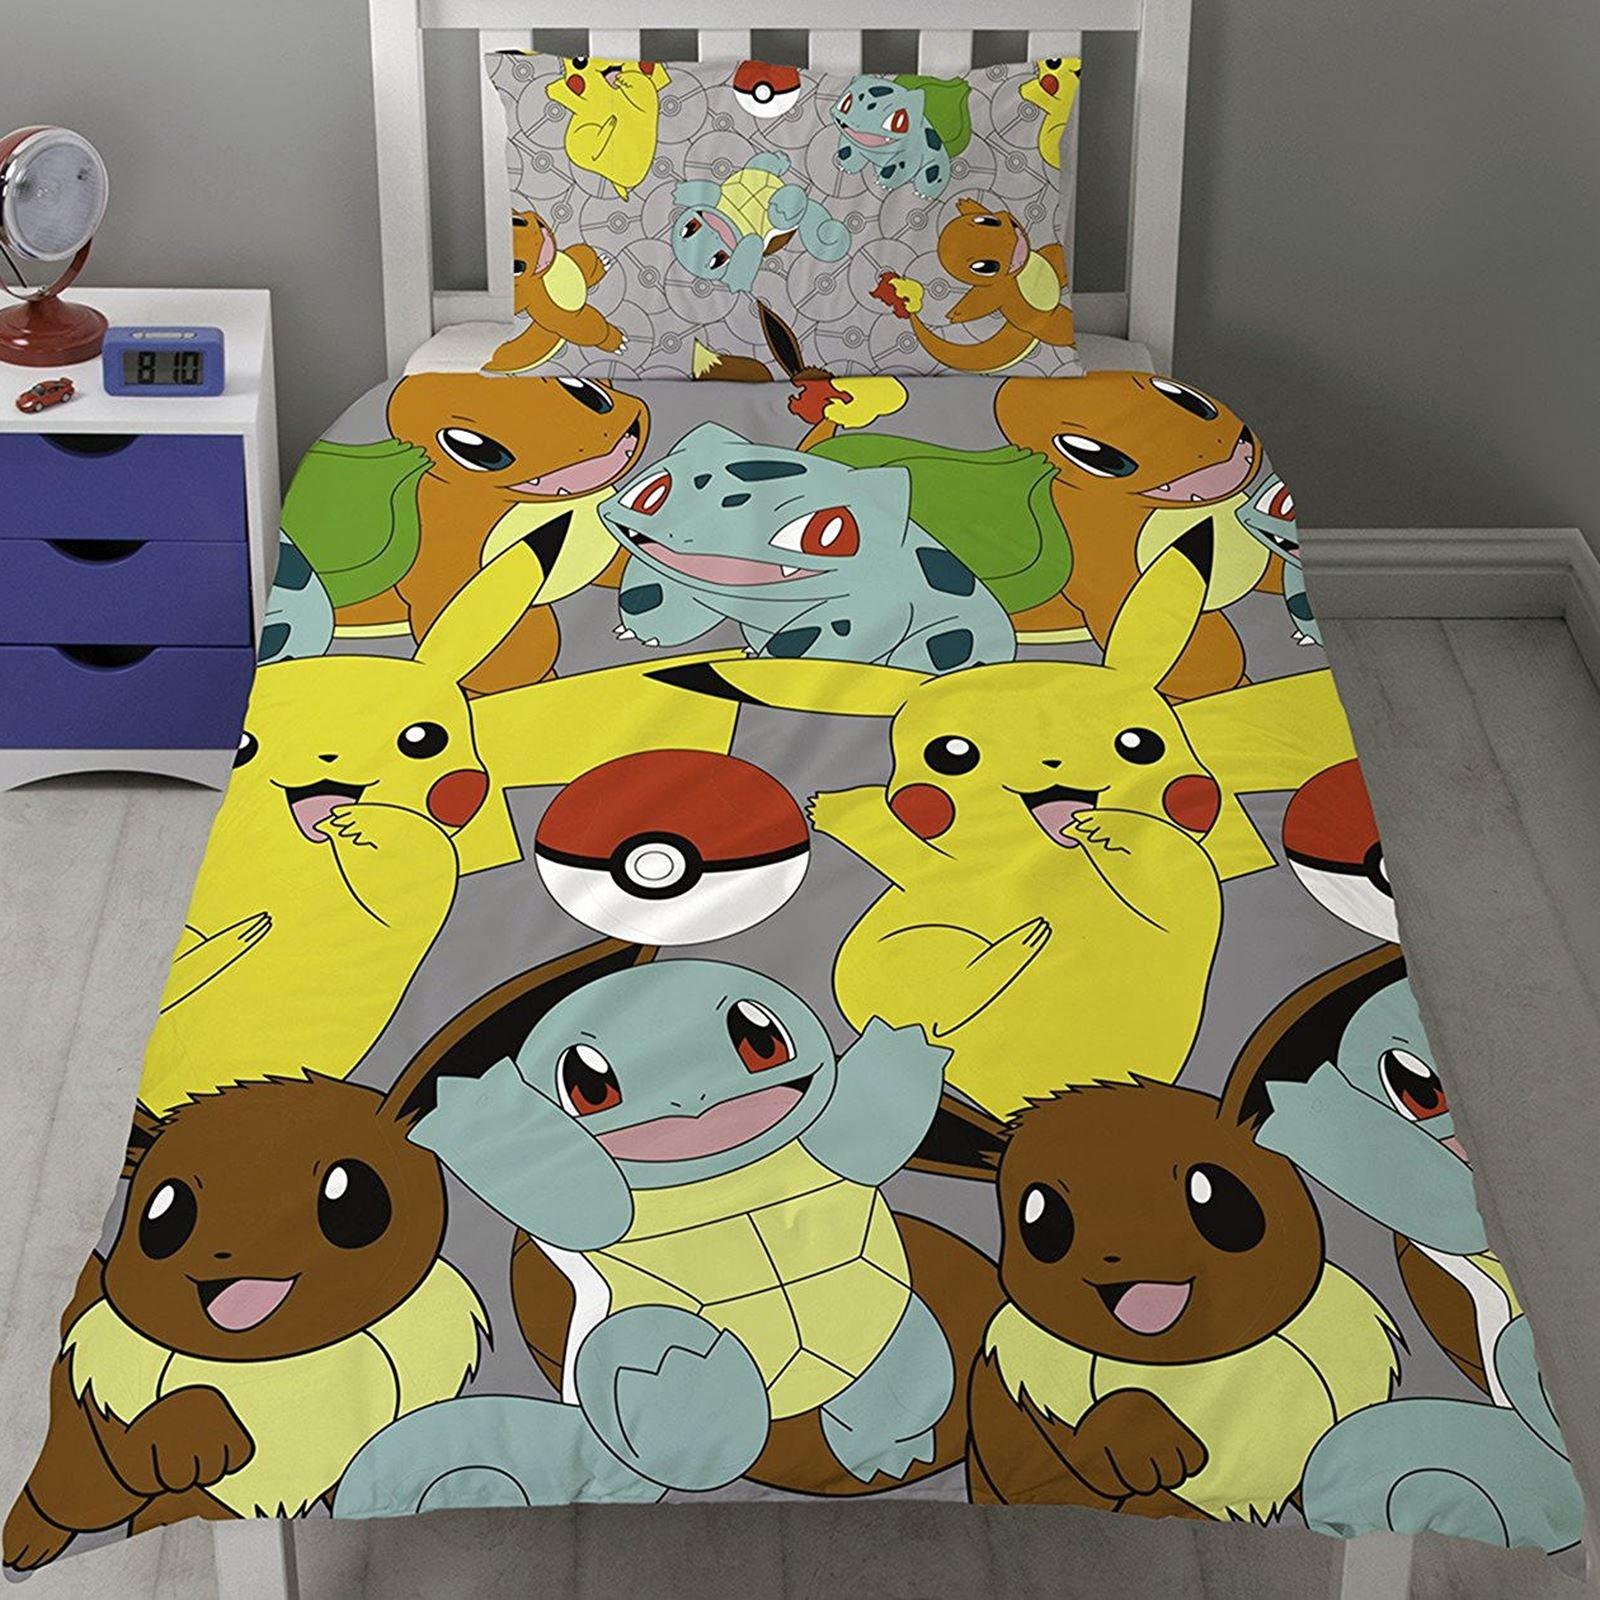 Pokémon Catch UK Single/US Twin Rotary Duvet Cover and Pillowcase Set by Pokemon